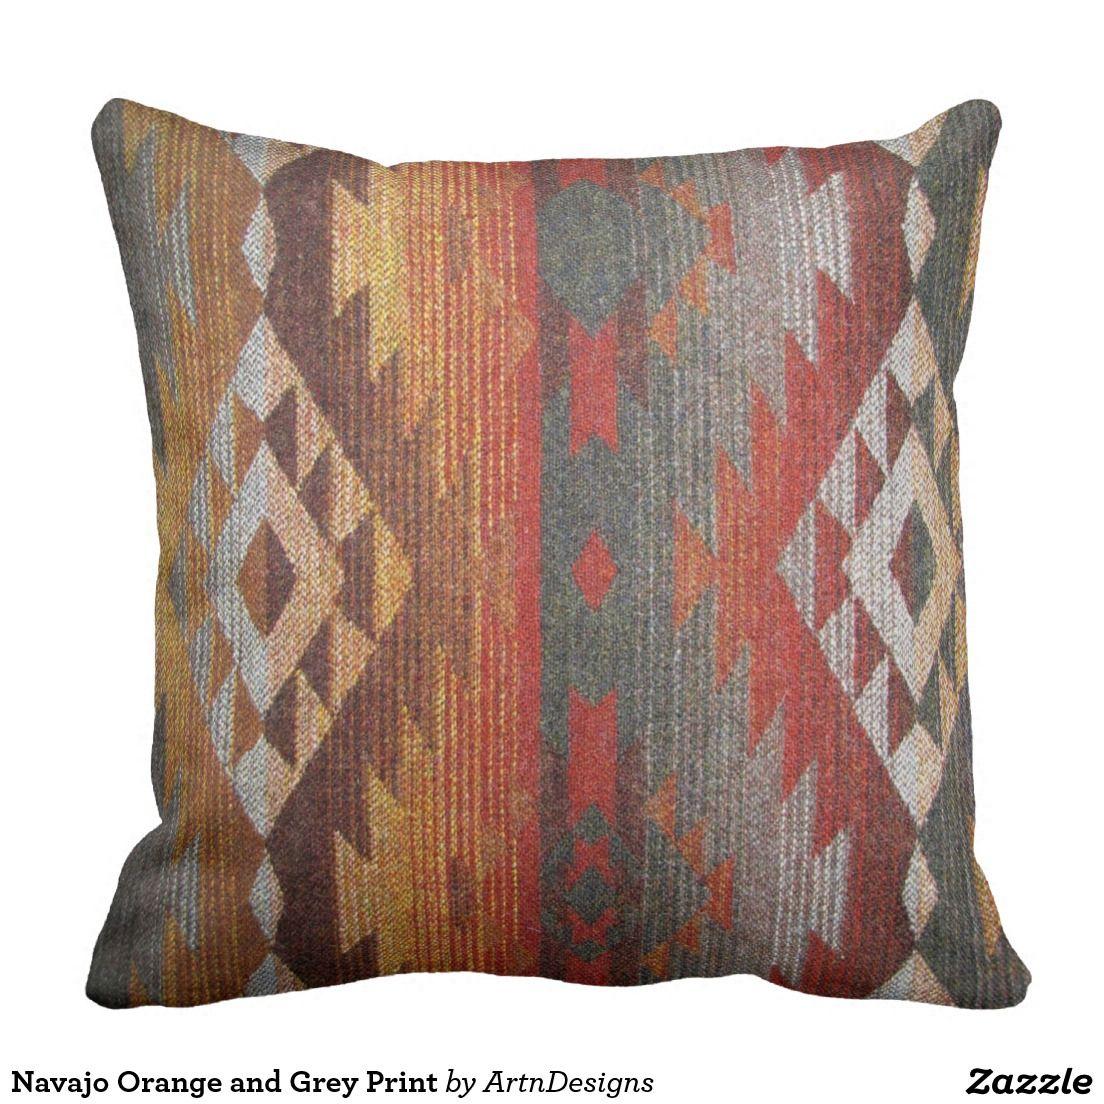 Navajo Orange and Grey Print Throw Pillow | Navajo, Gray and Throw ...